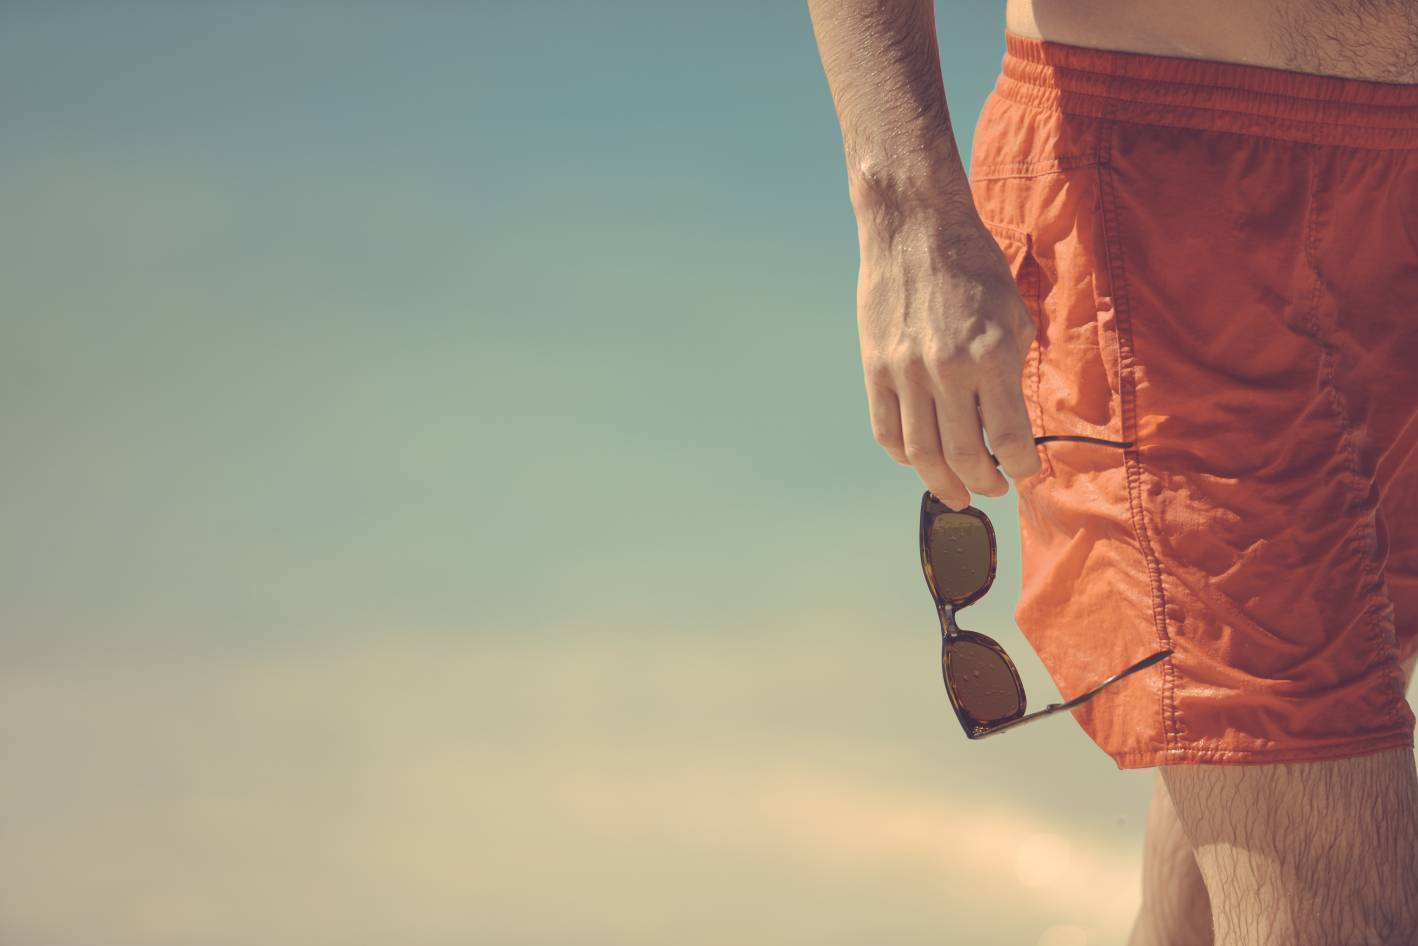 menswear, style, fashion, men's style, men's fashion, wardrobe essentials, style essentials, summer wardrobe, swimwear, swim trunks